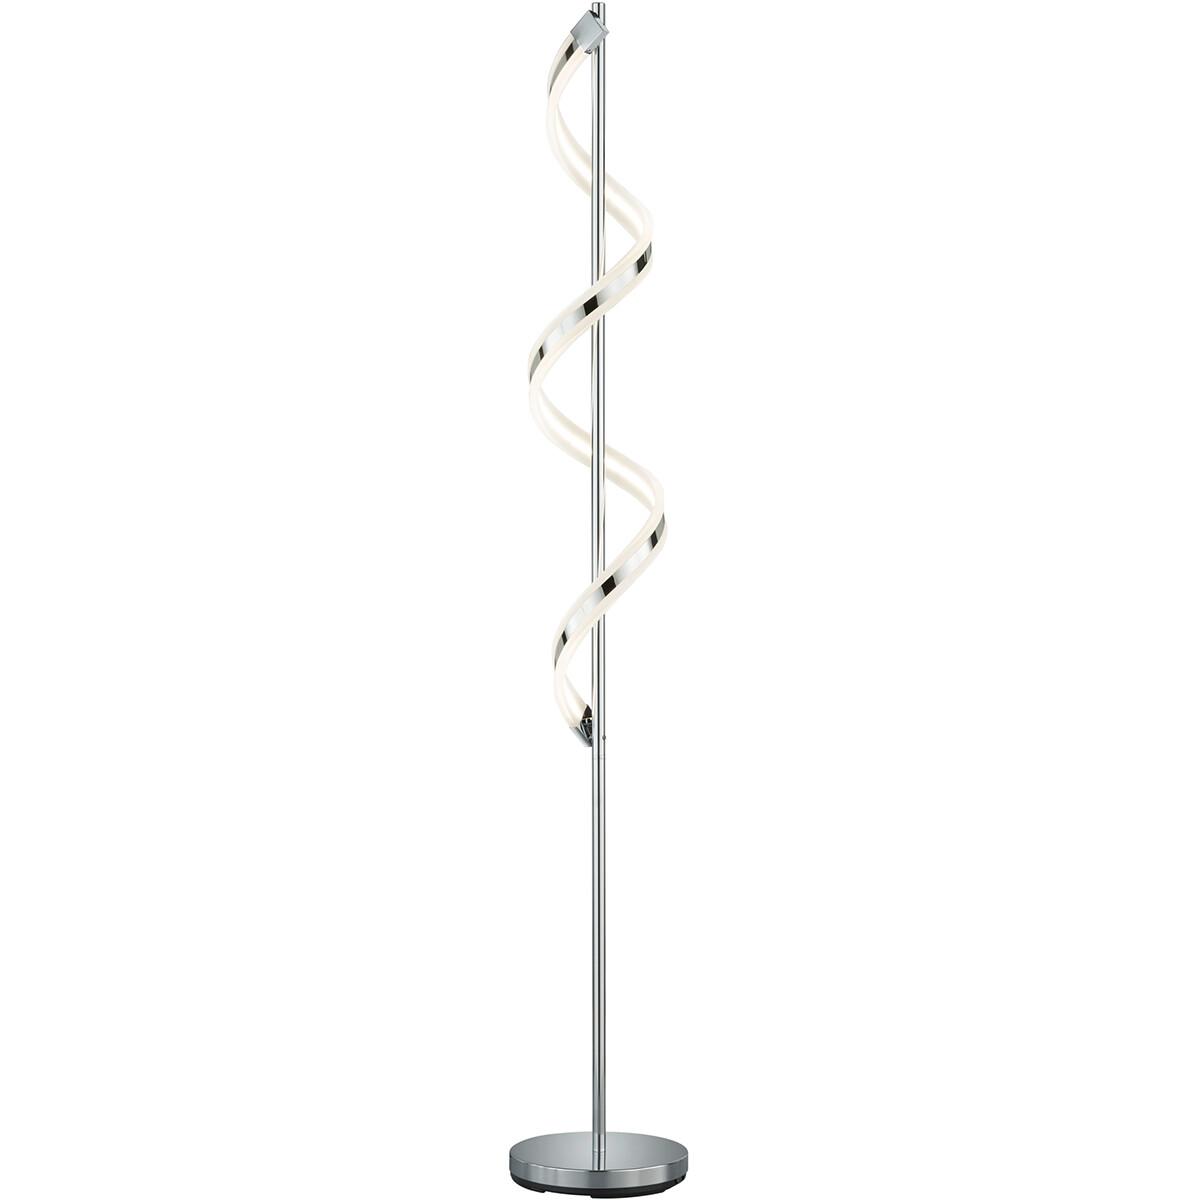 LED Vloerlamp - Trion Syndi - 20W - Warm Wit 3000K - Dimbaar - Rond - Mat Chroom - Aluminium